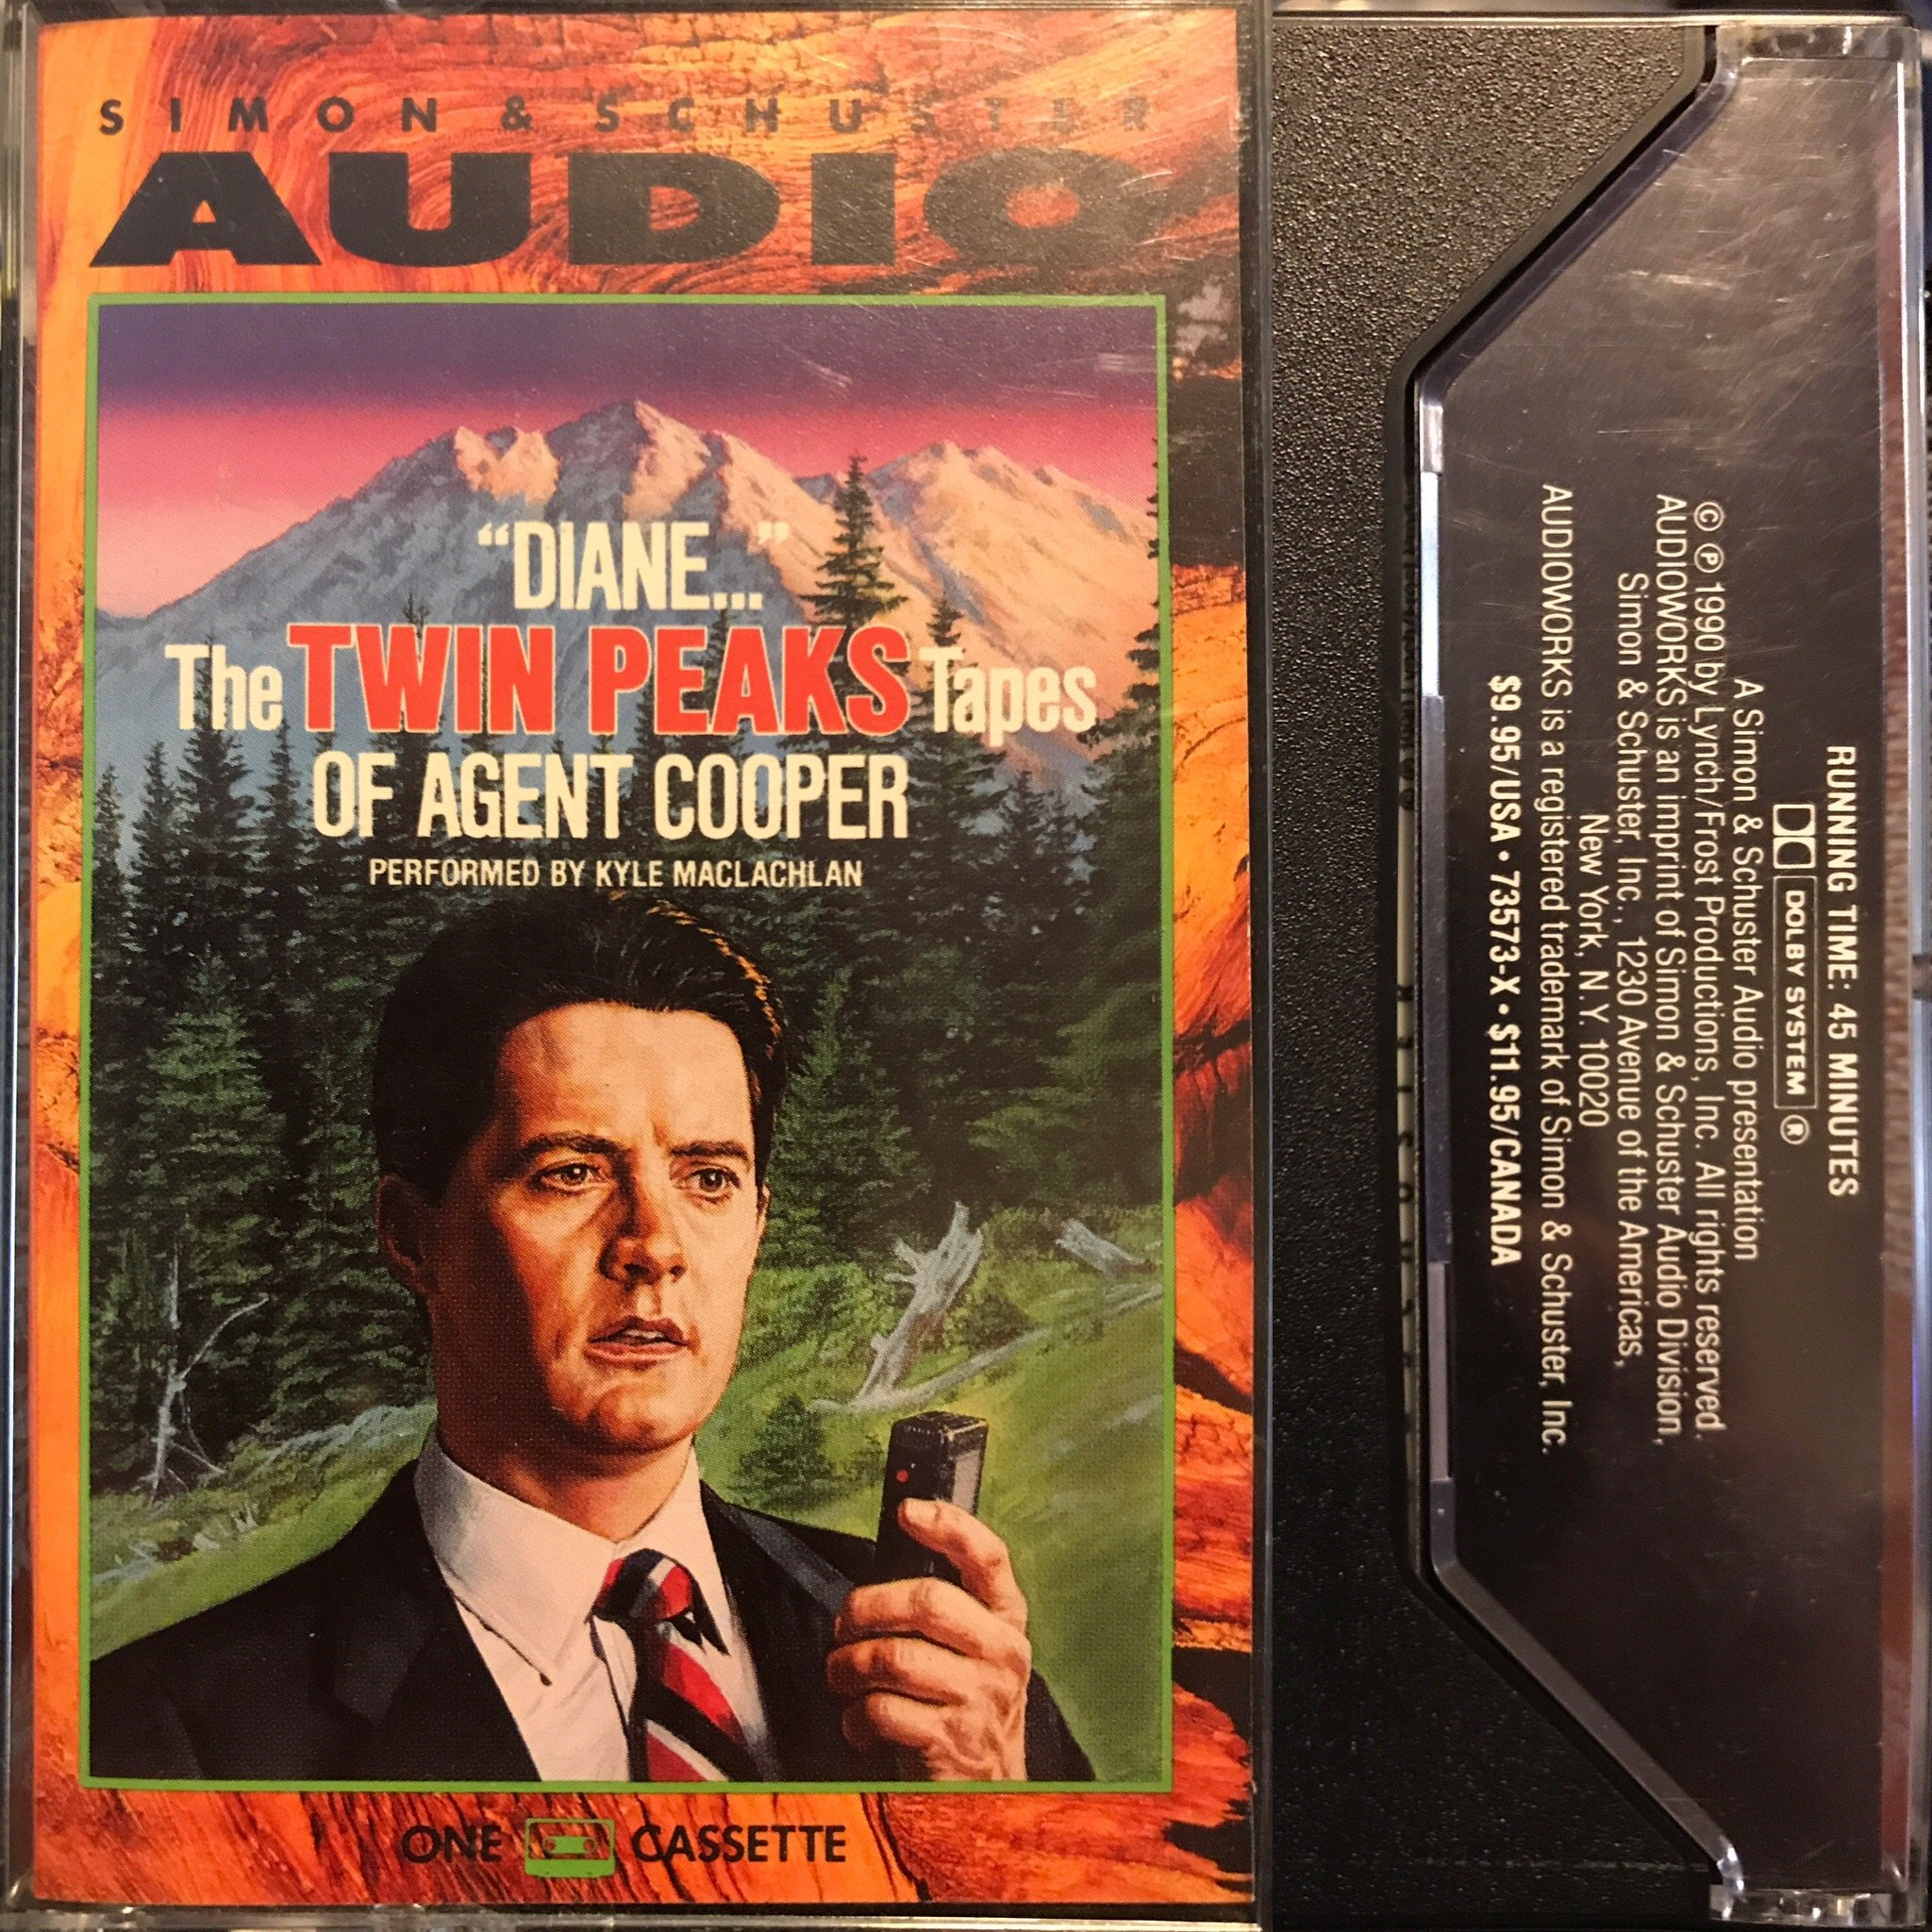 Diane: The Twin Peaks Tapes of Agent Cooper: Amazon.es: Lynch: Libros en idiomas extranjeros